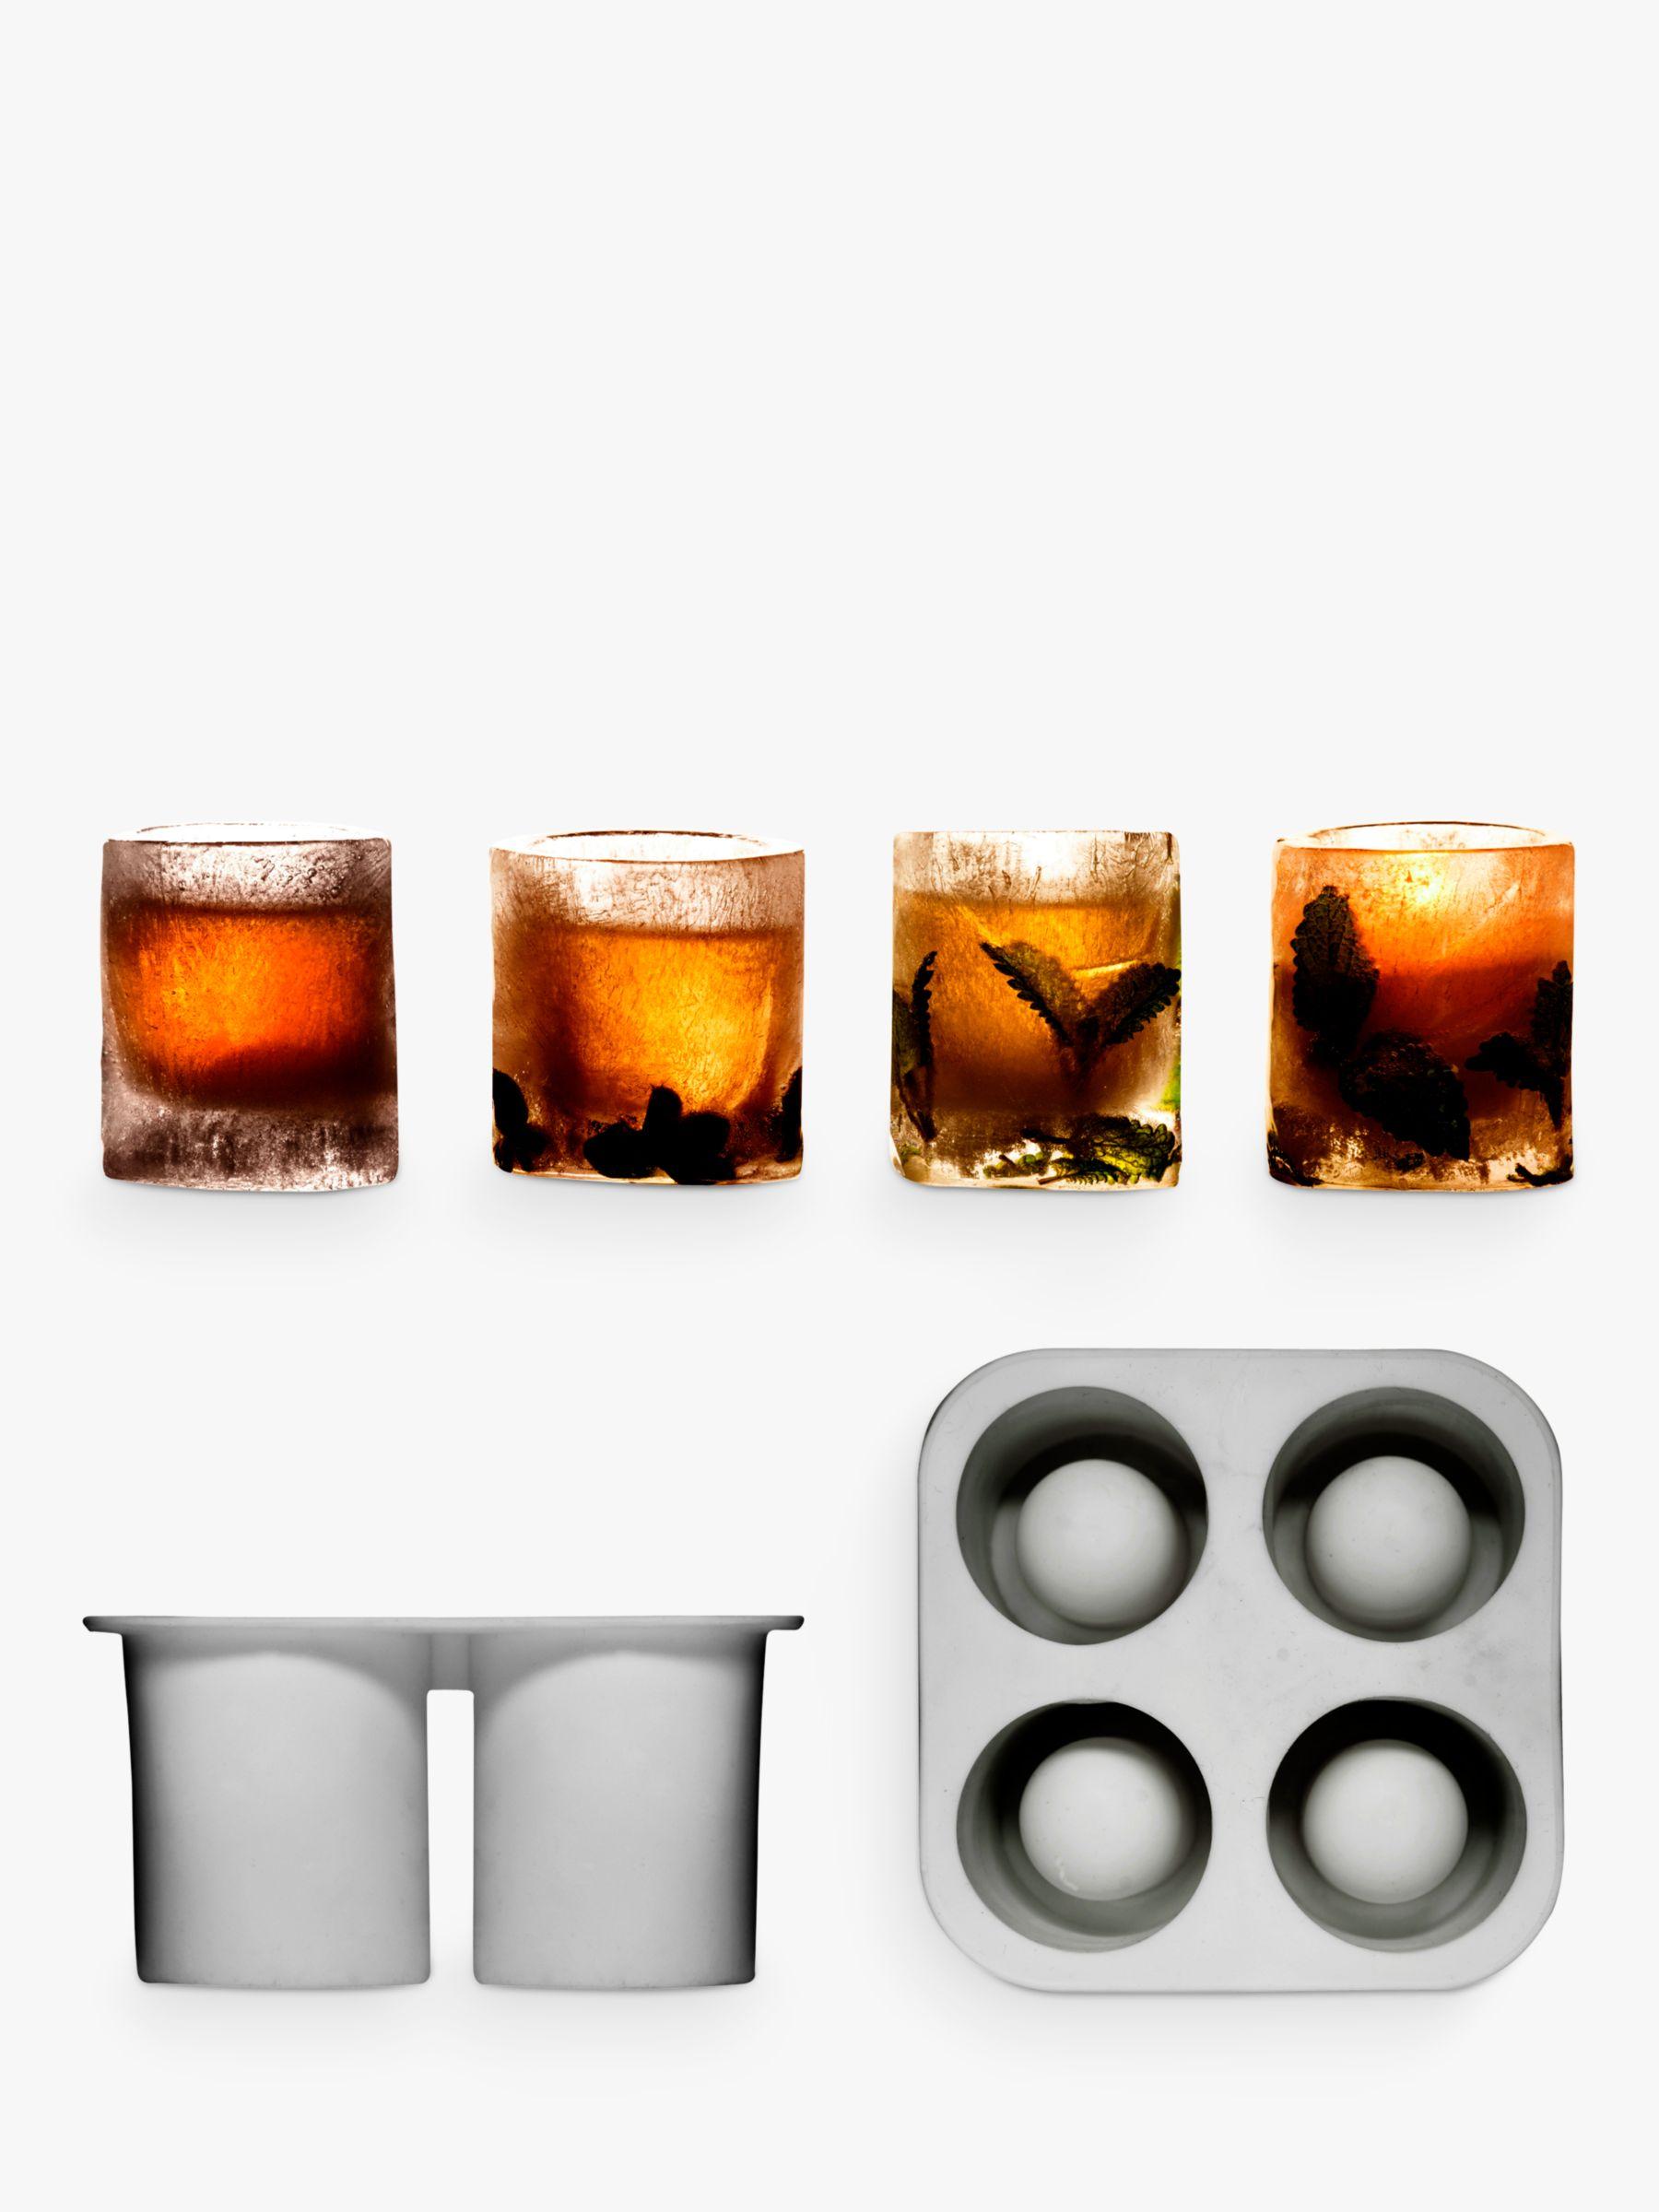 Sagaform Sagaform Ice Shot Glass Mould, Set of 4, Clear